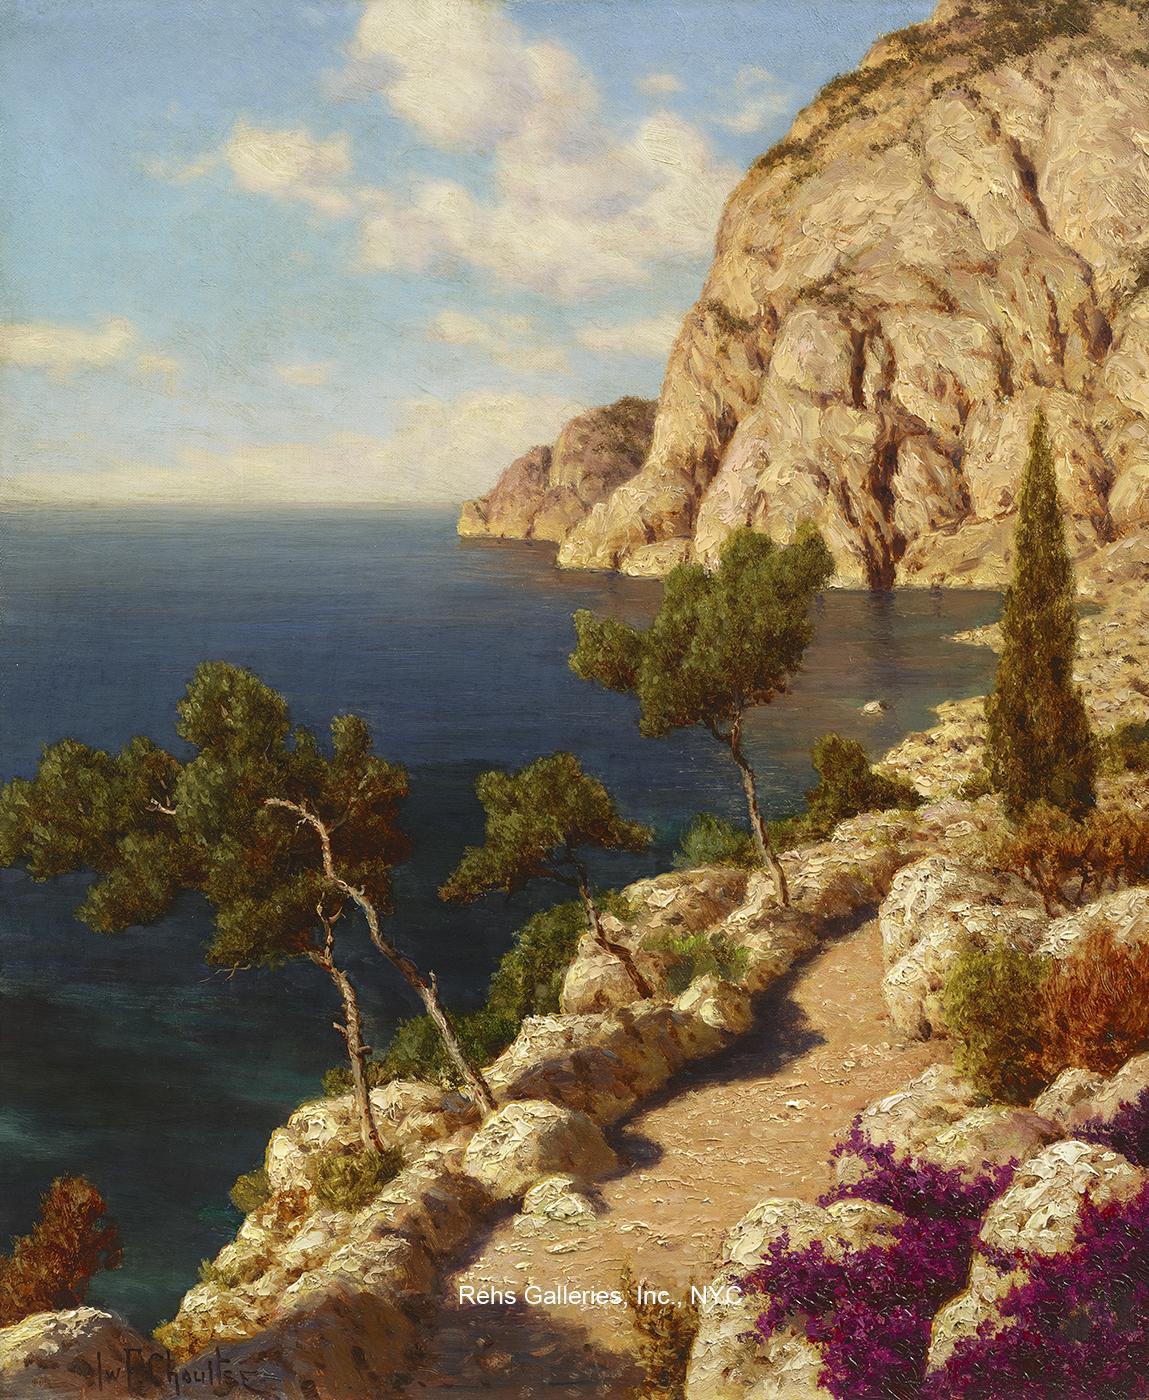 Ivan Choultse - Capri